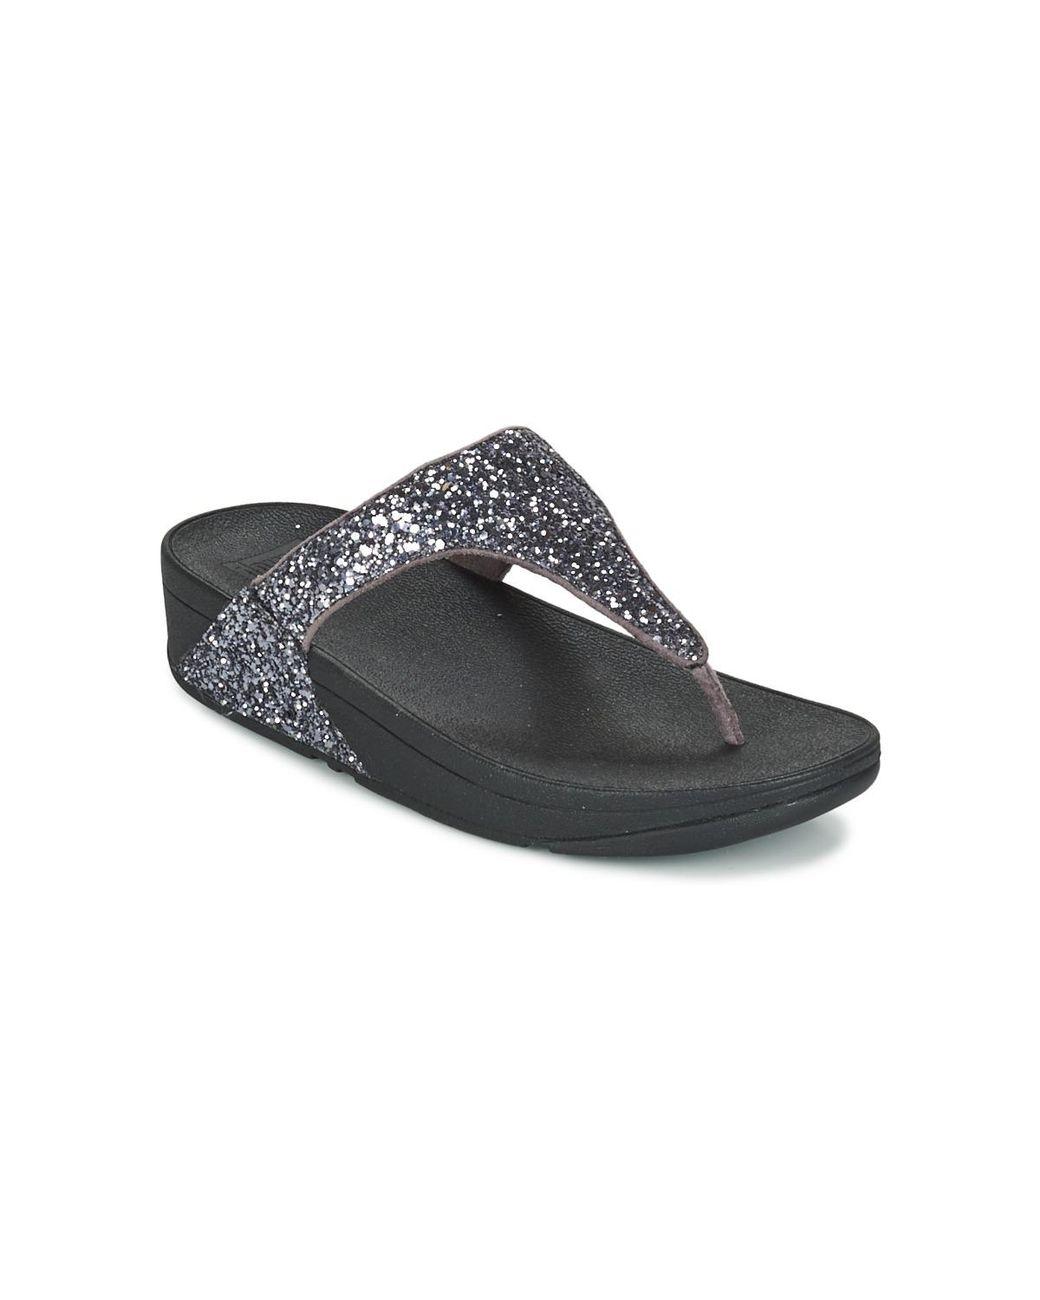 3811e0026 Fitflop Glitterball Toepost Women s Flip Flops   Sandals (shoes) In Silver  in Metallic - Save 9% - Lyst